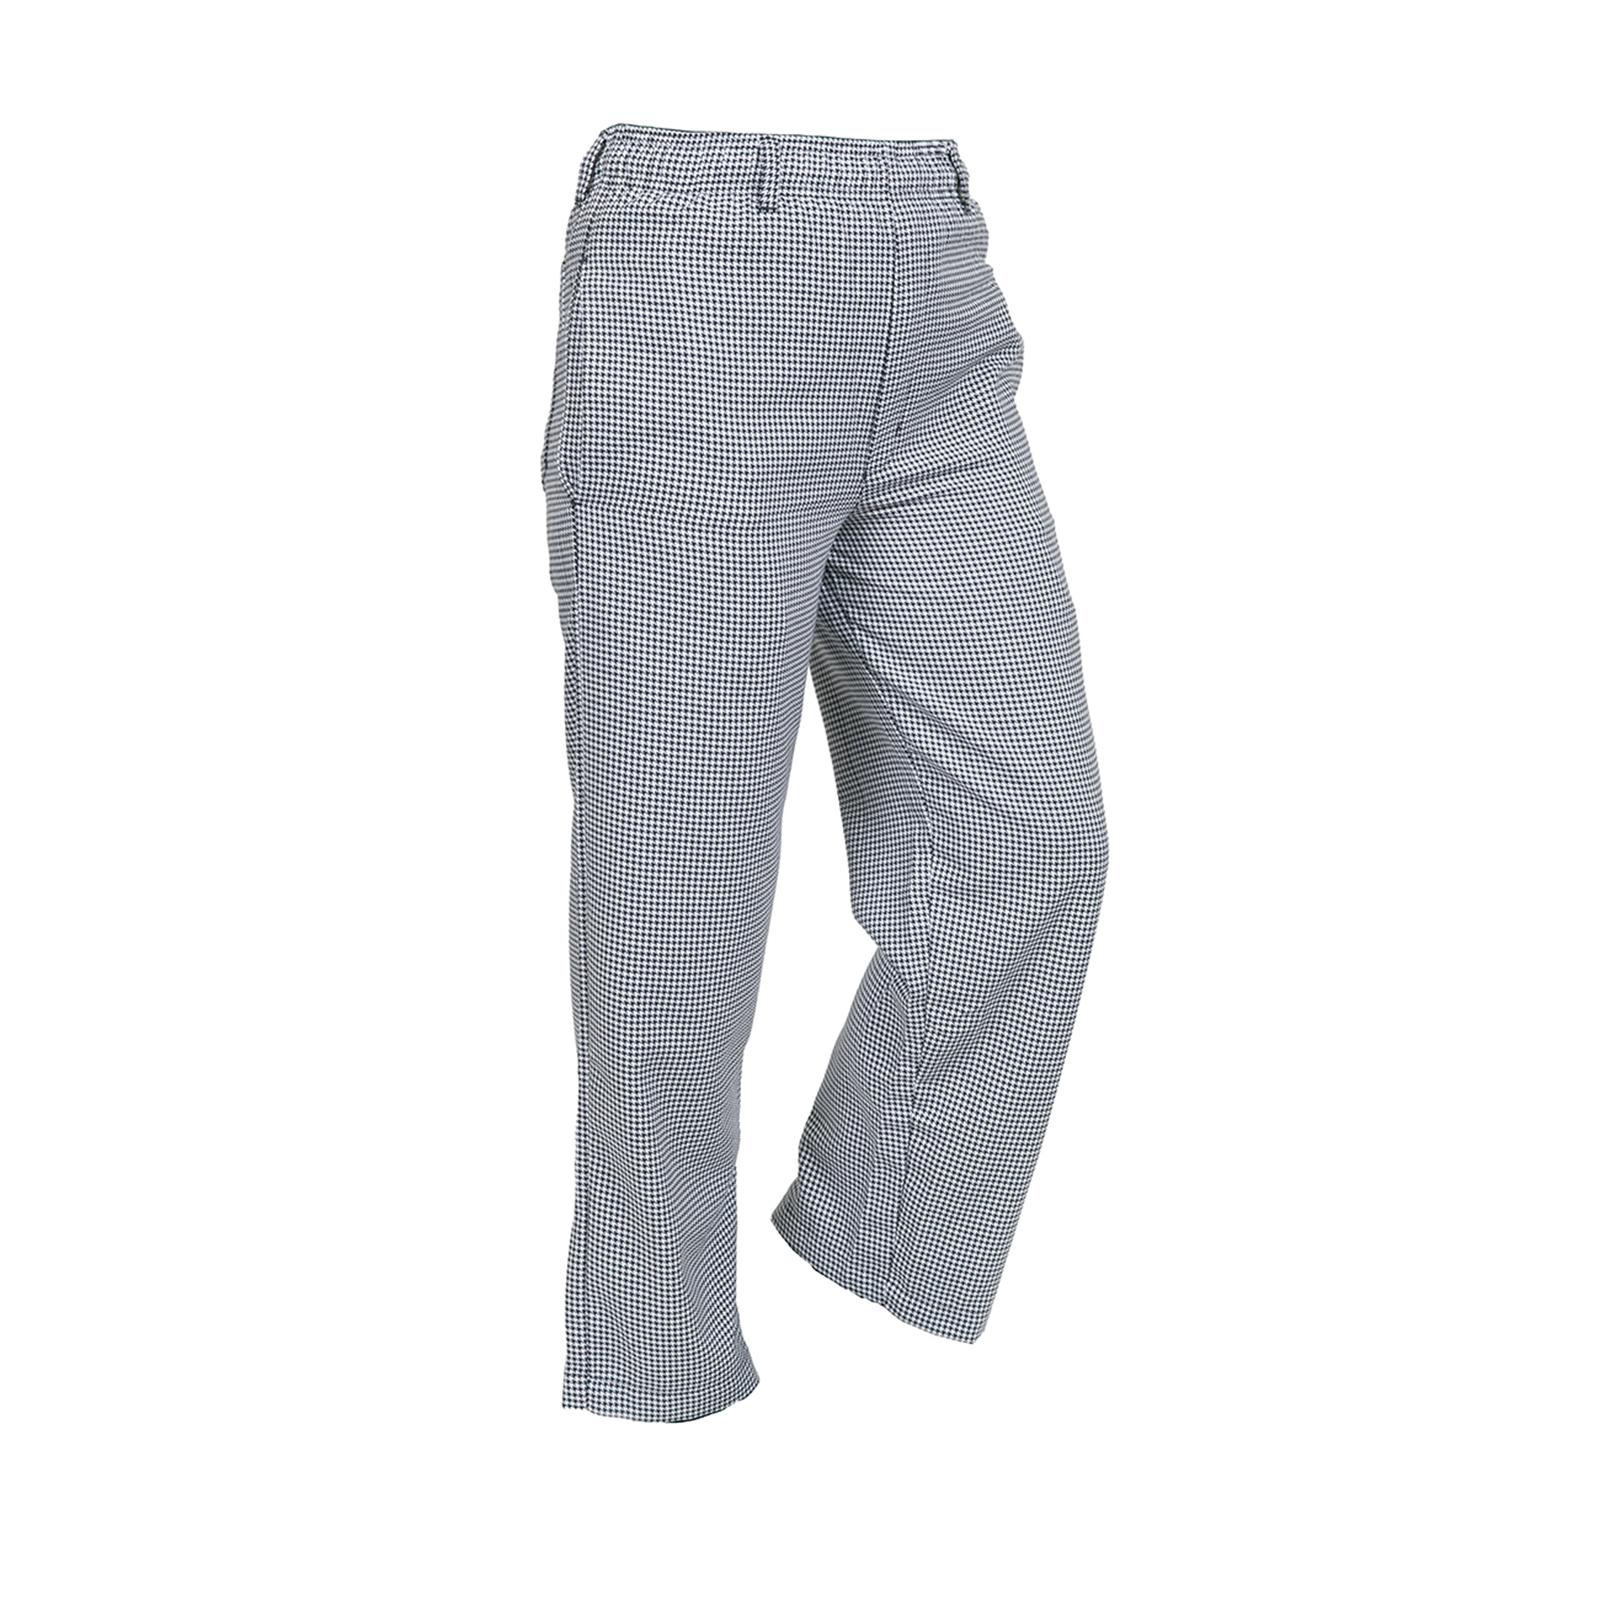 Mercer Culinary M60030HT8X chef's pants